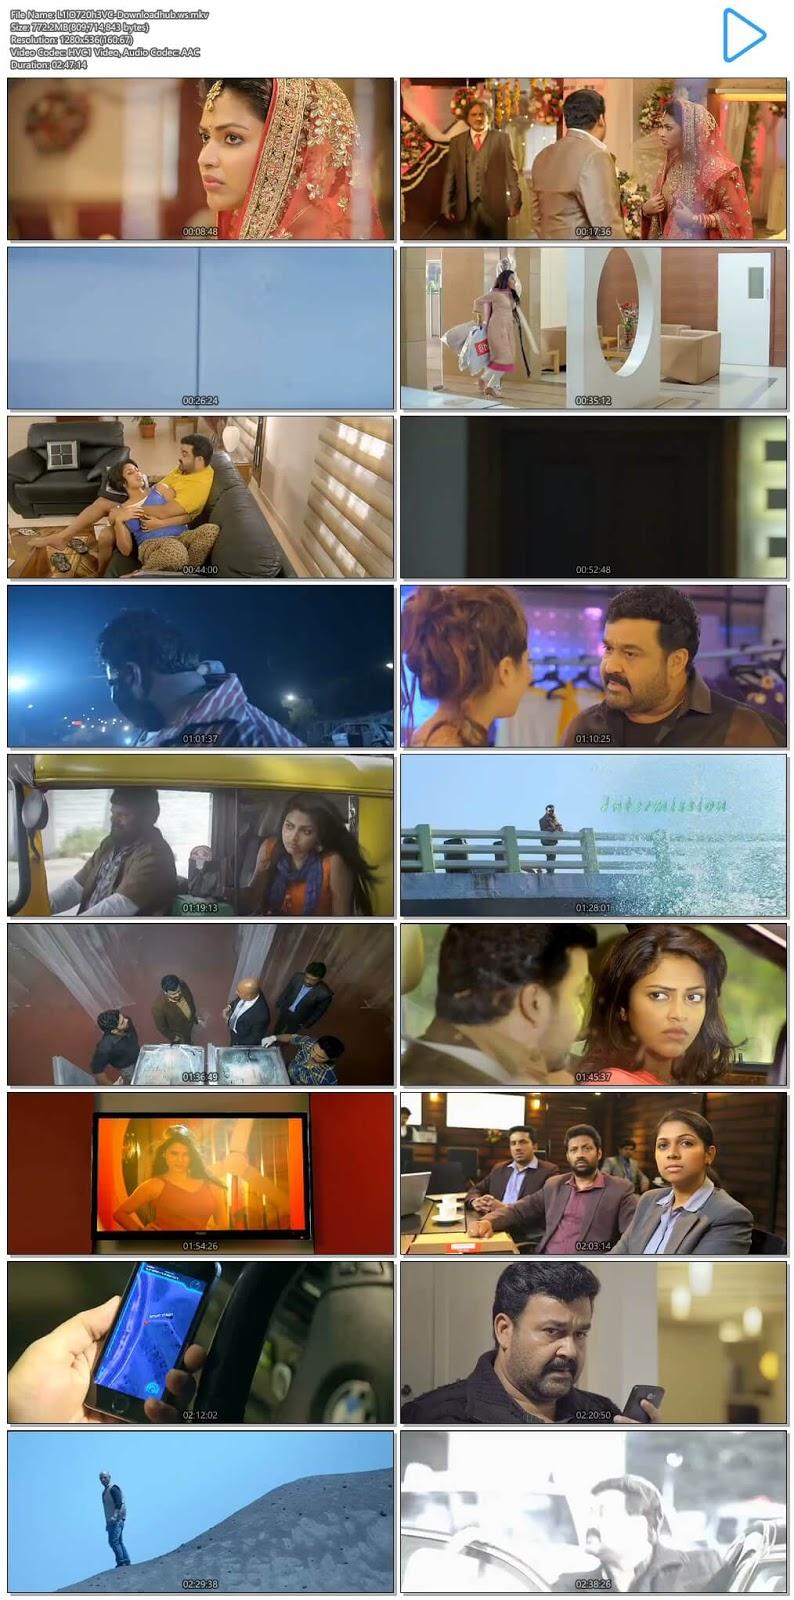 Lailaa O Lailaa 2015 UNCUT Hindi Dual Audio 720p HEVC DVDRip